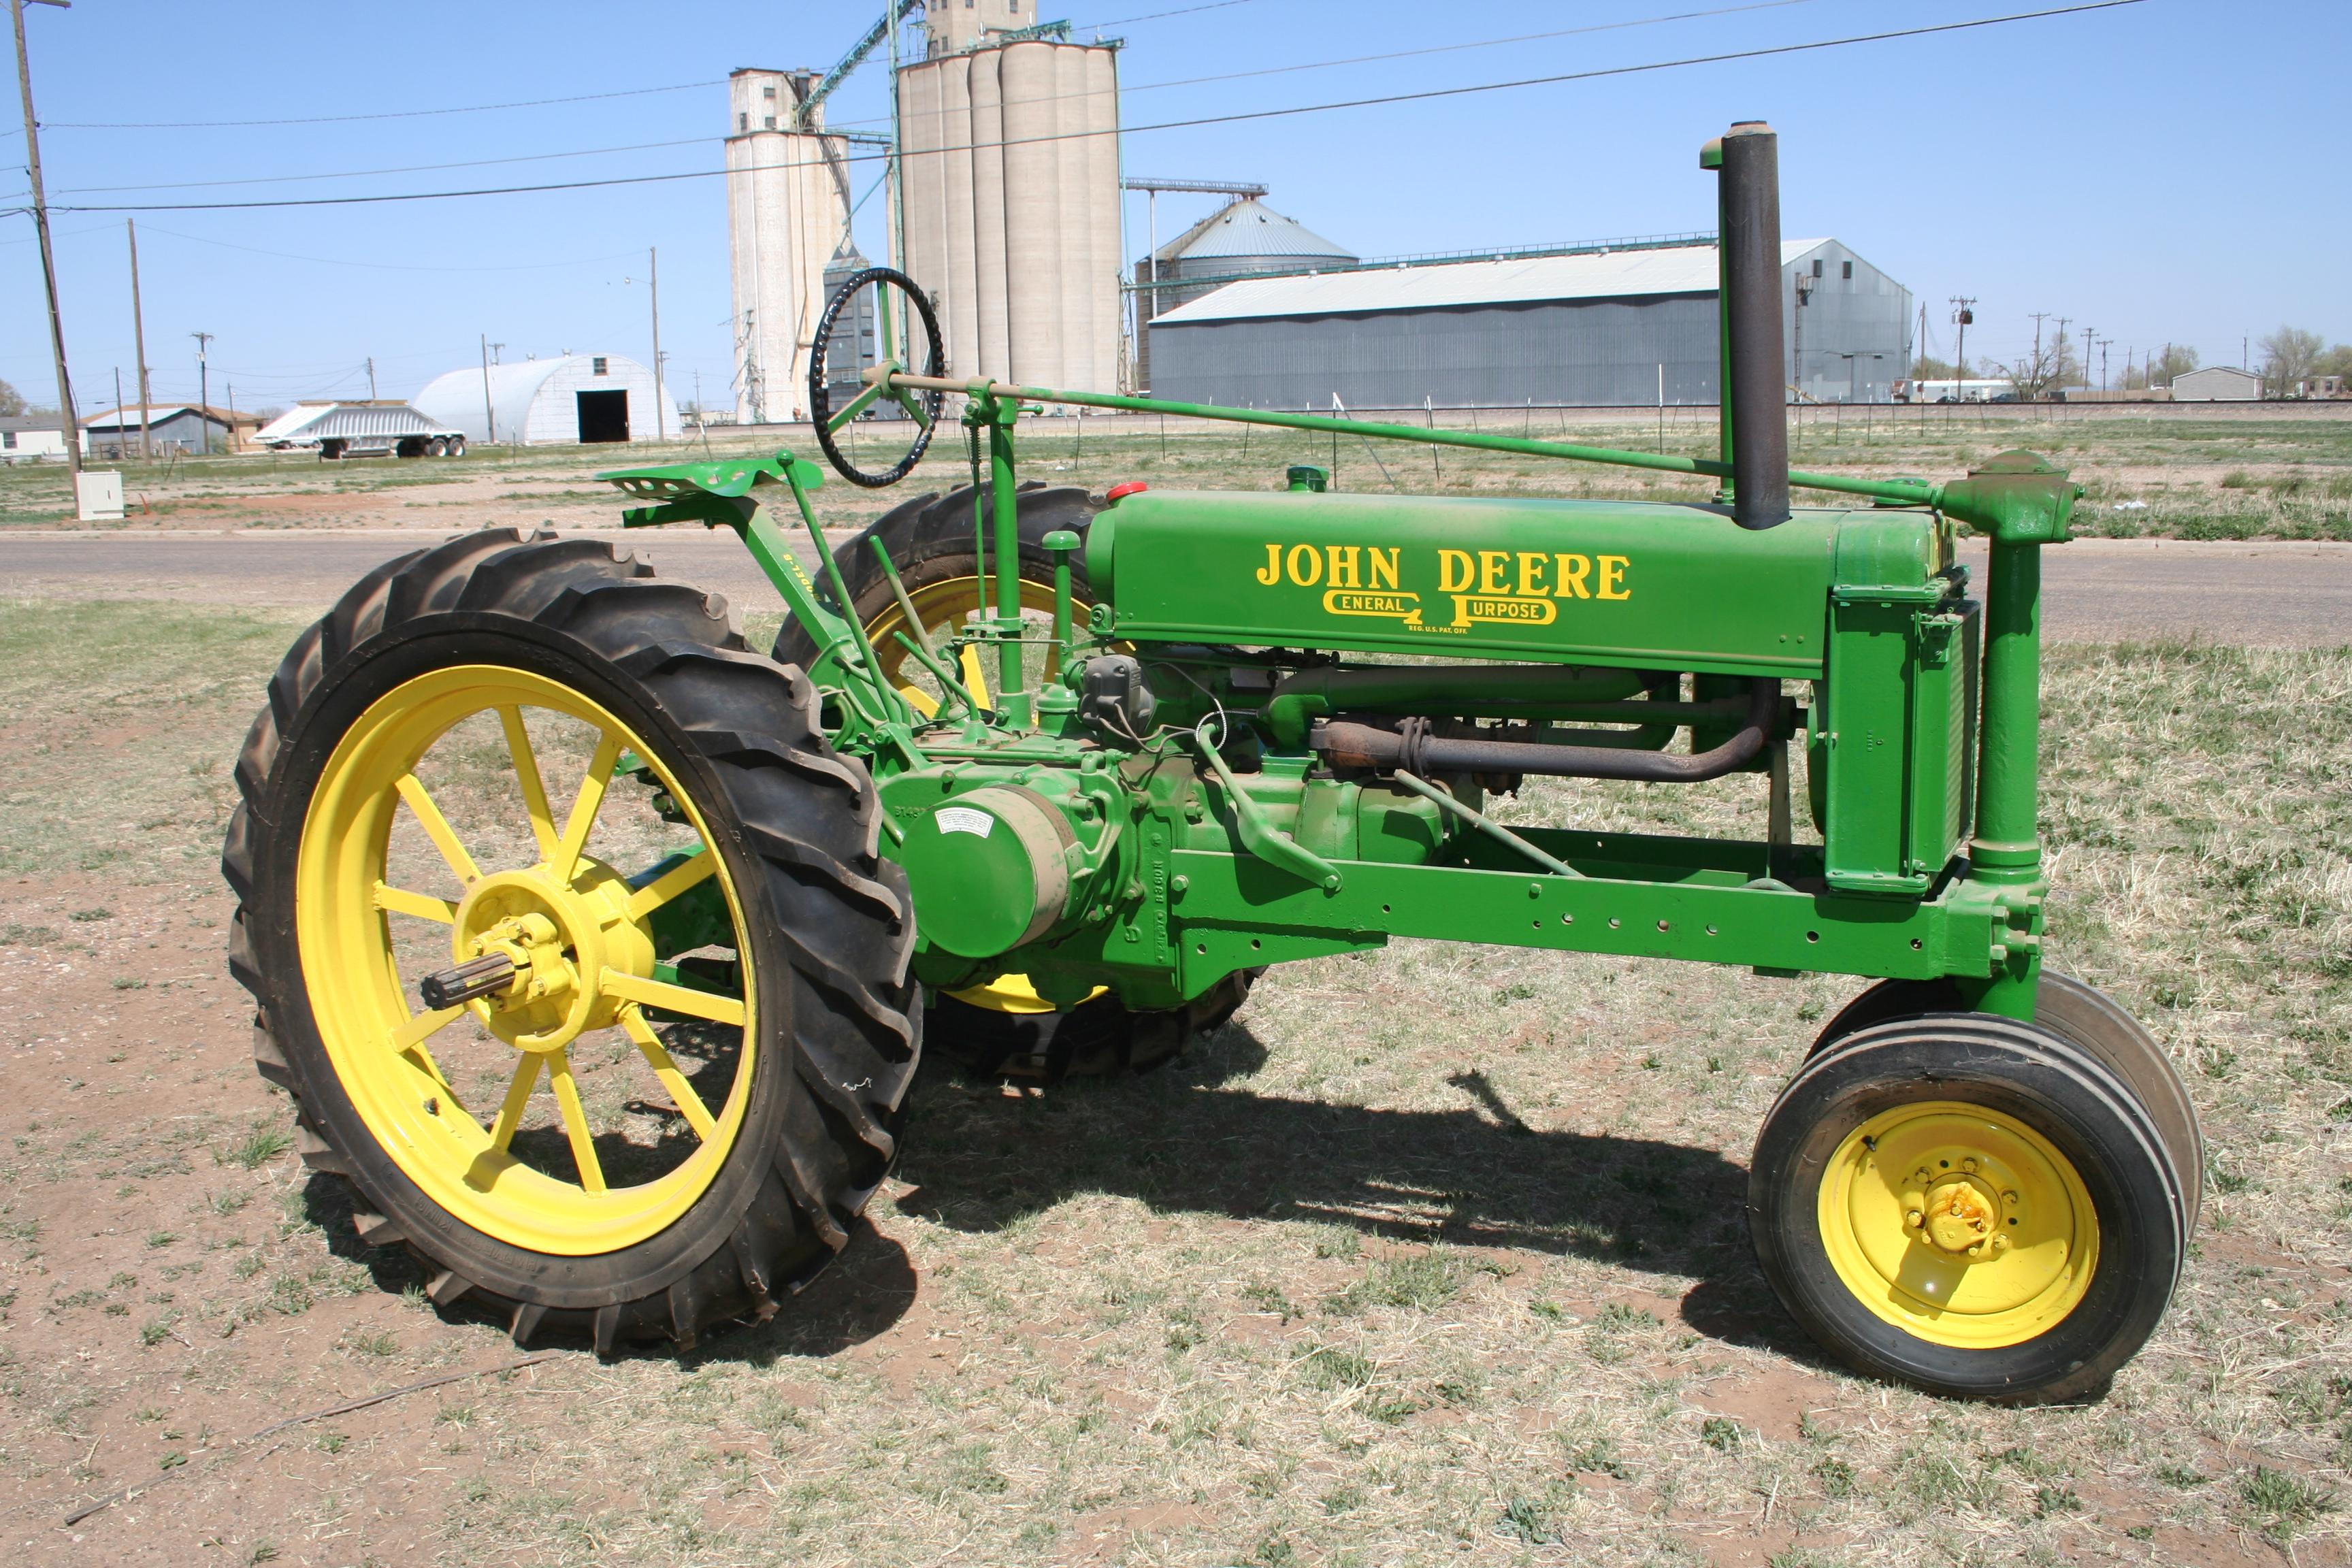 John Deere B Engine Parts : John deere b parts tractor engine and wiring